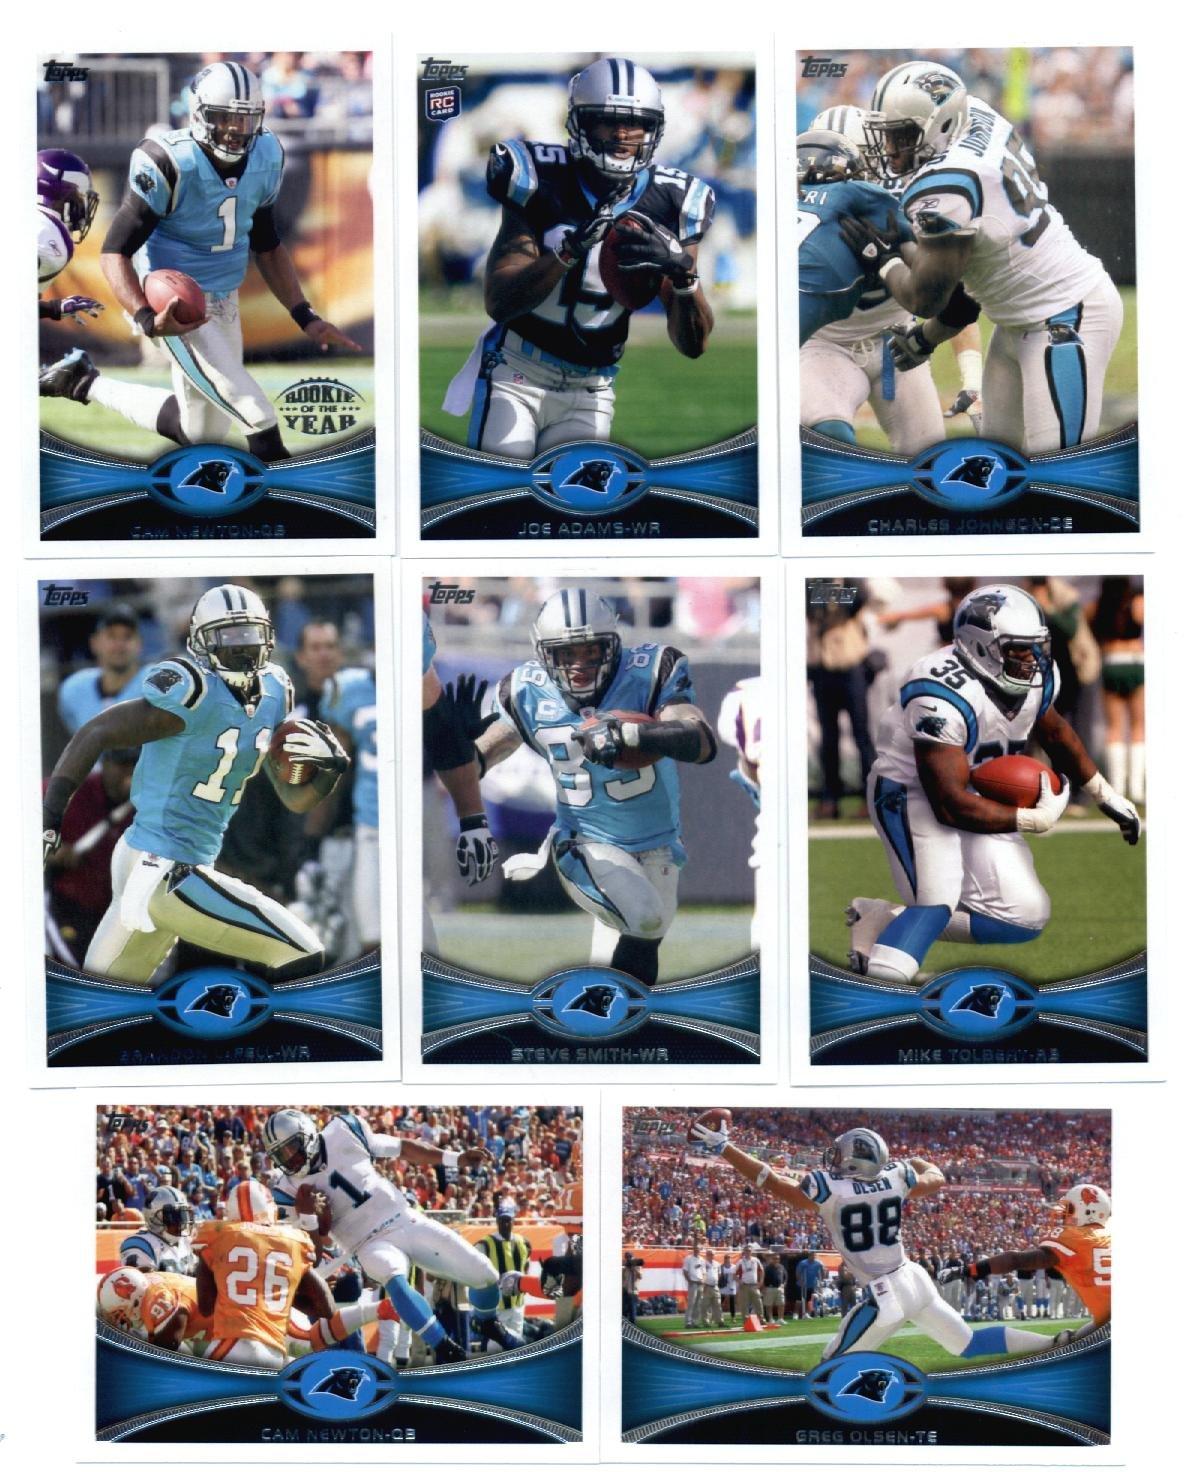 2012 Topps Carolina Panthers NFLチームセット(。 Sealed ) – – 13カードなど B00B7A3DHE、カムニュートン、DeAngeloウィリアムズ、Tolbert、スティーブスミス、Stewart、Kuechly RC、ジョーアダムスRC and more。 B00B7A3DHE, 家具のHirayama:ea6fd8a2 --- harrow-unison.org.uk